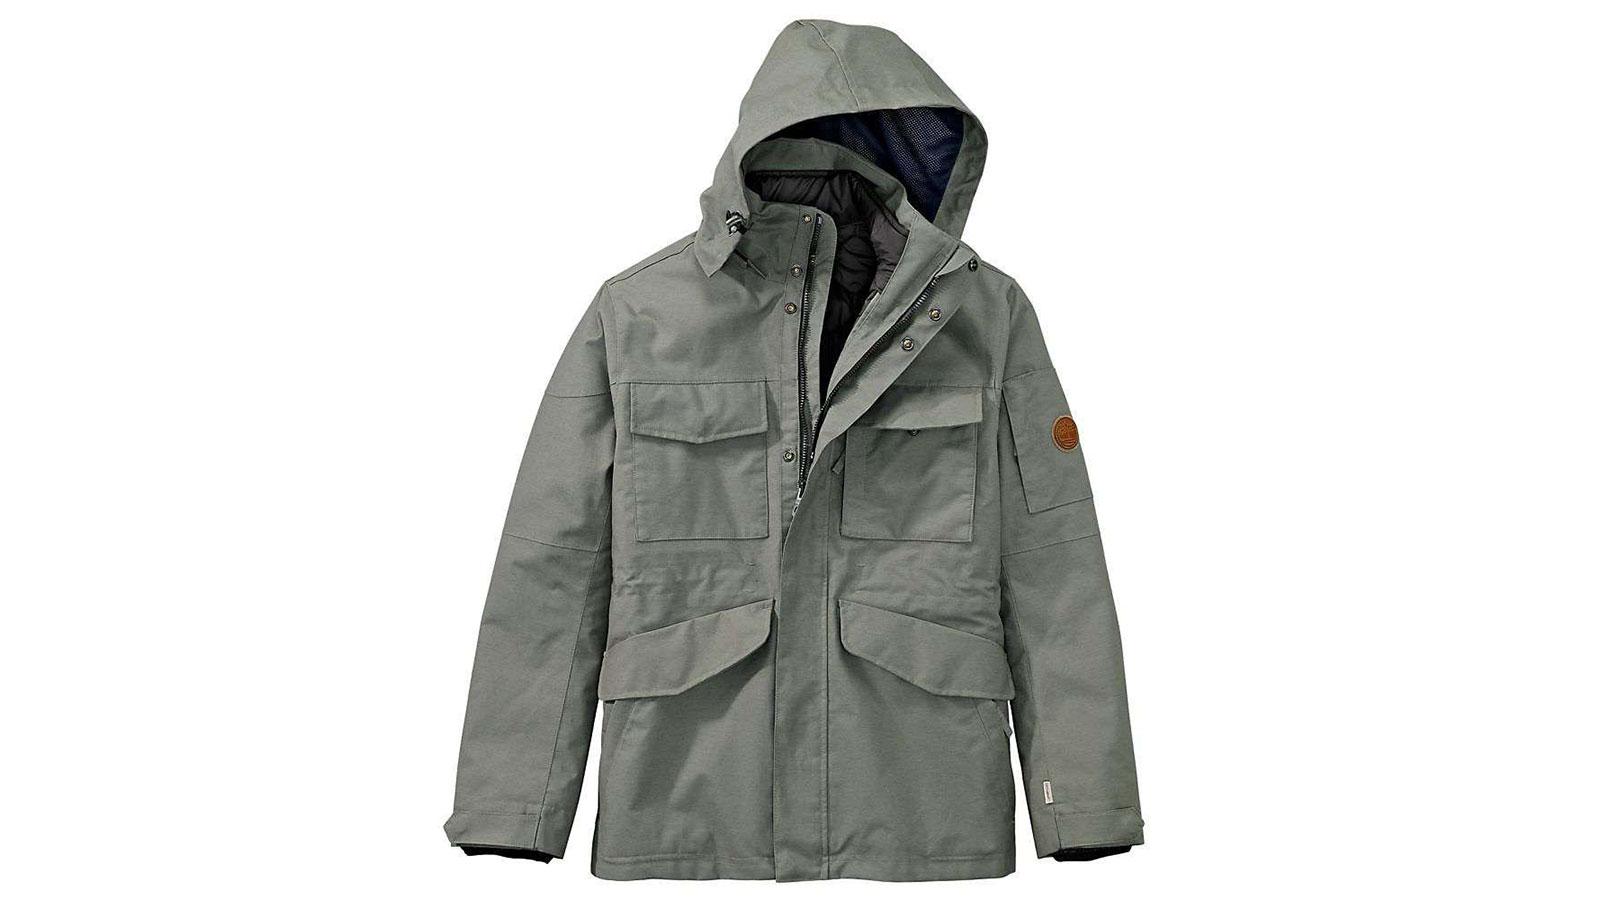 timberland-dryvent-3-in-1-waterproof-field-jacket-1